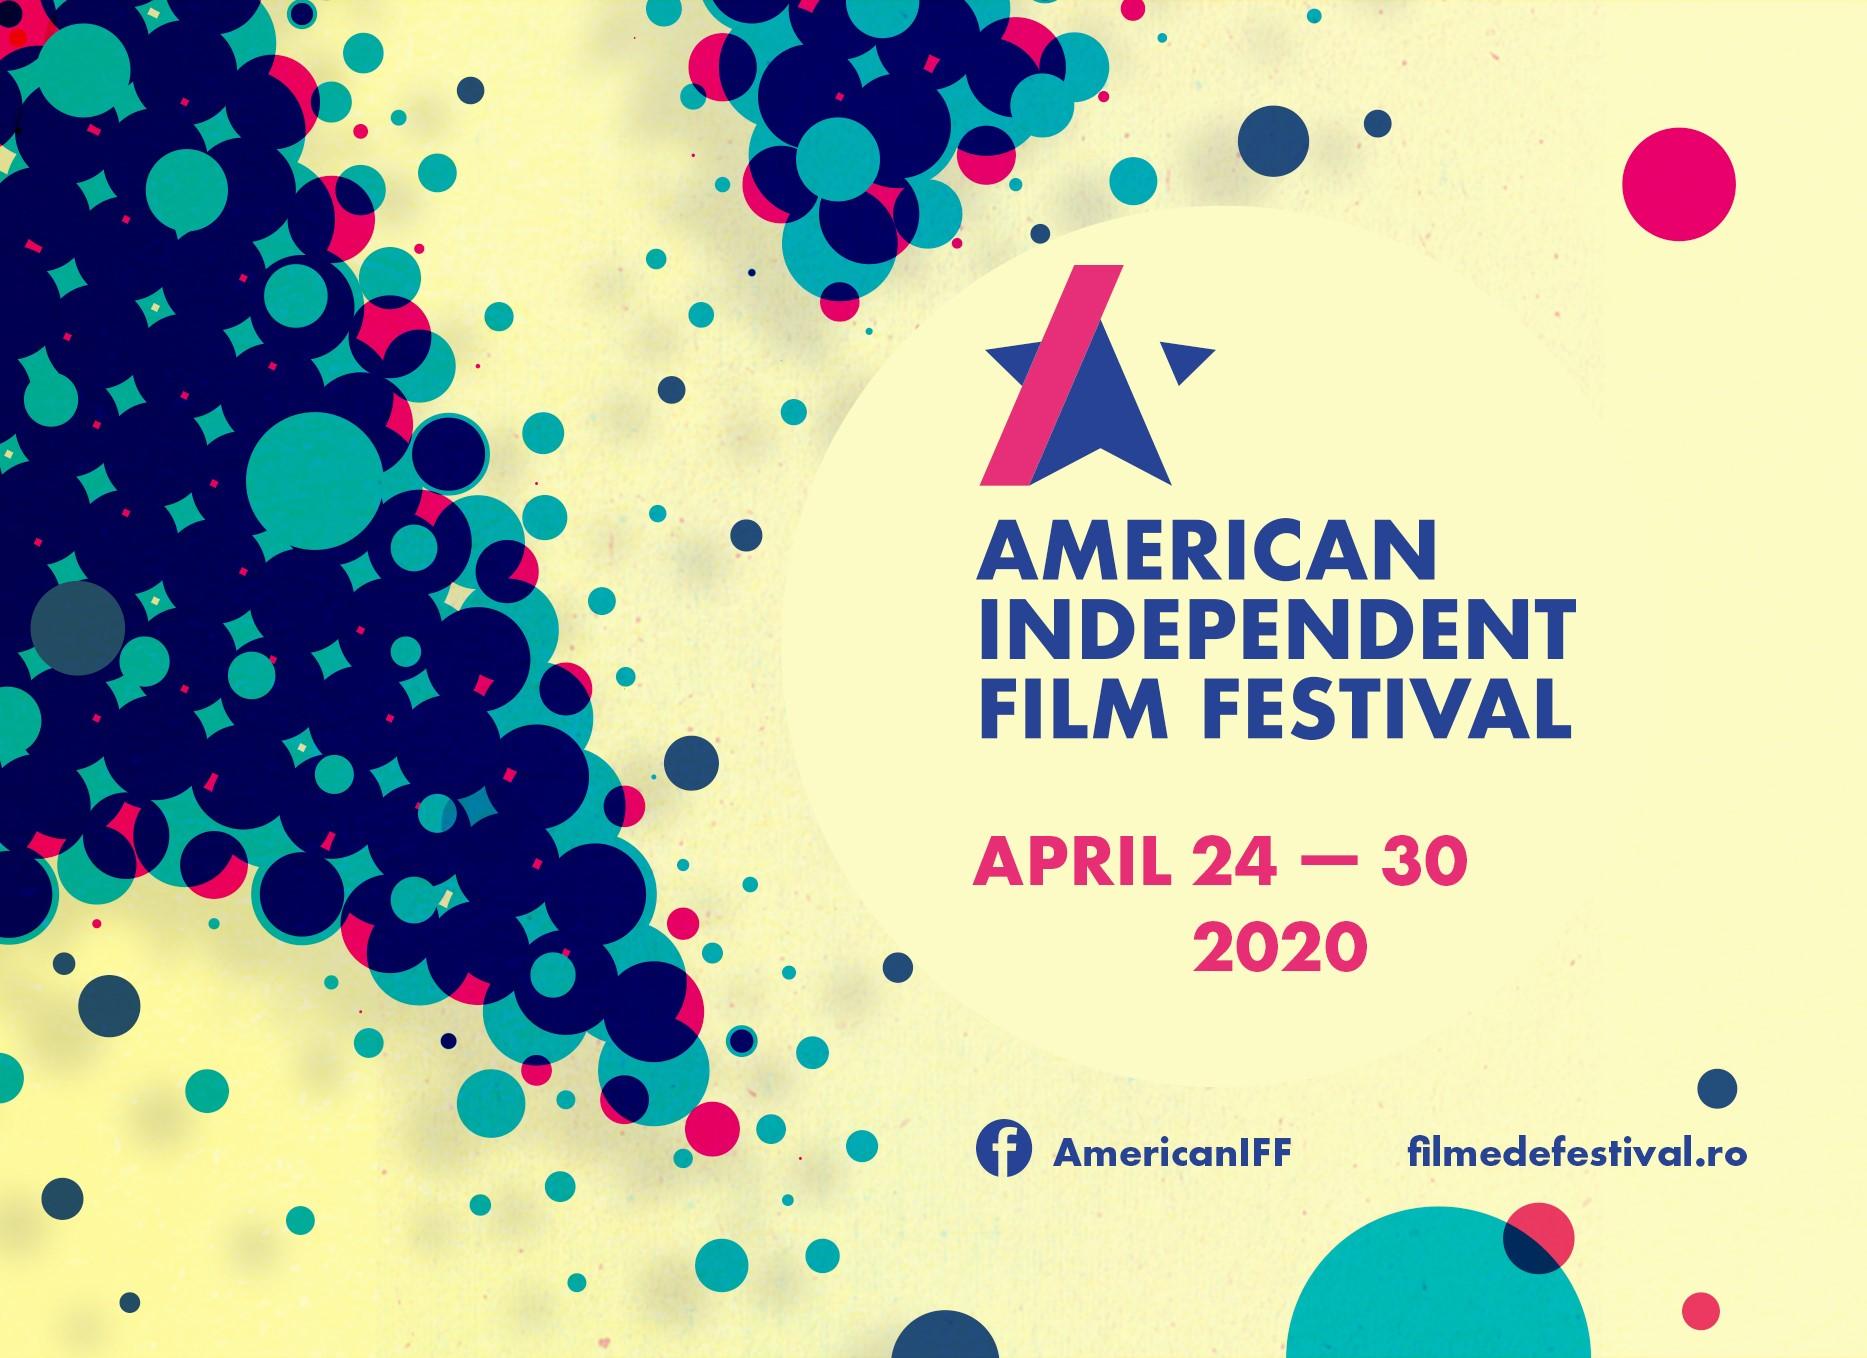 american independent film festival amanat